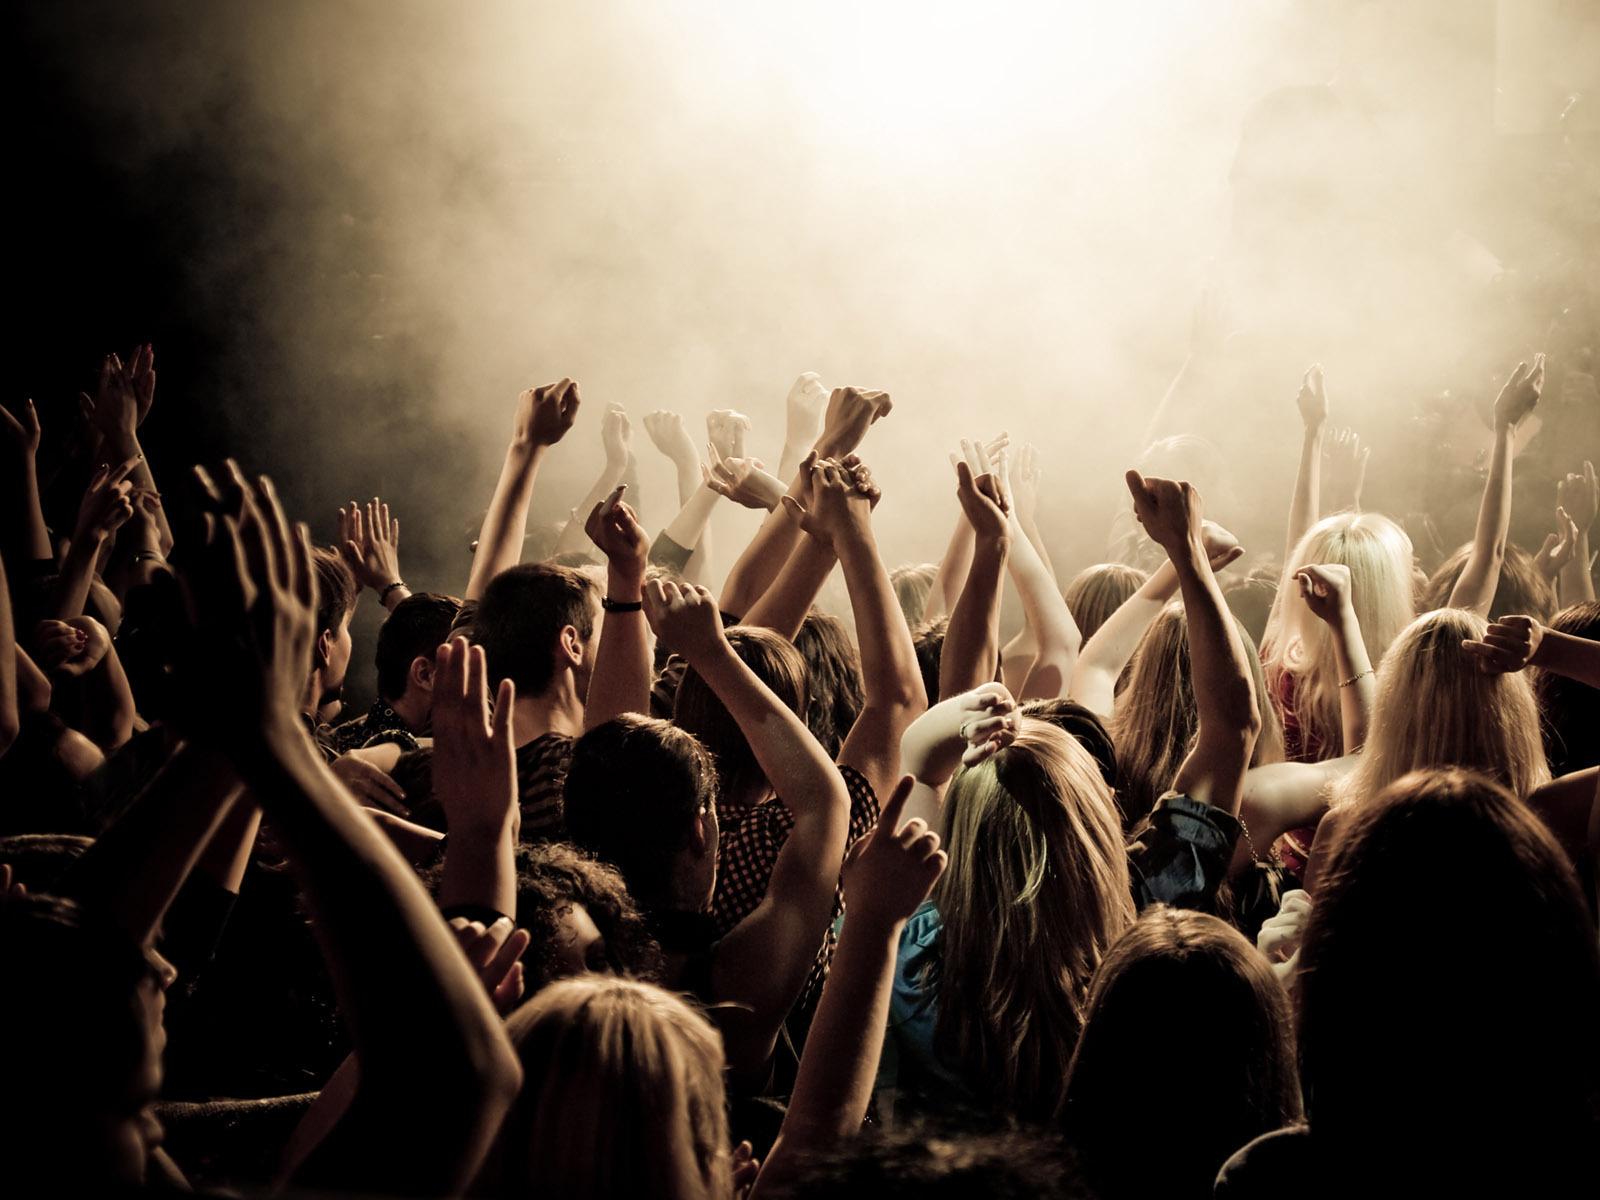 People Dancing Wallpaper Hd Wallpapers People Dancing In Concert 1600x1200 Wallpaper Teahub Io